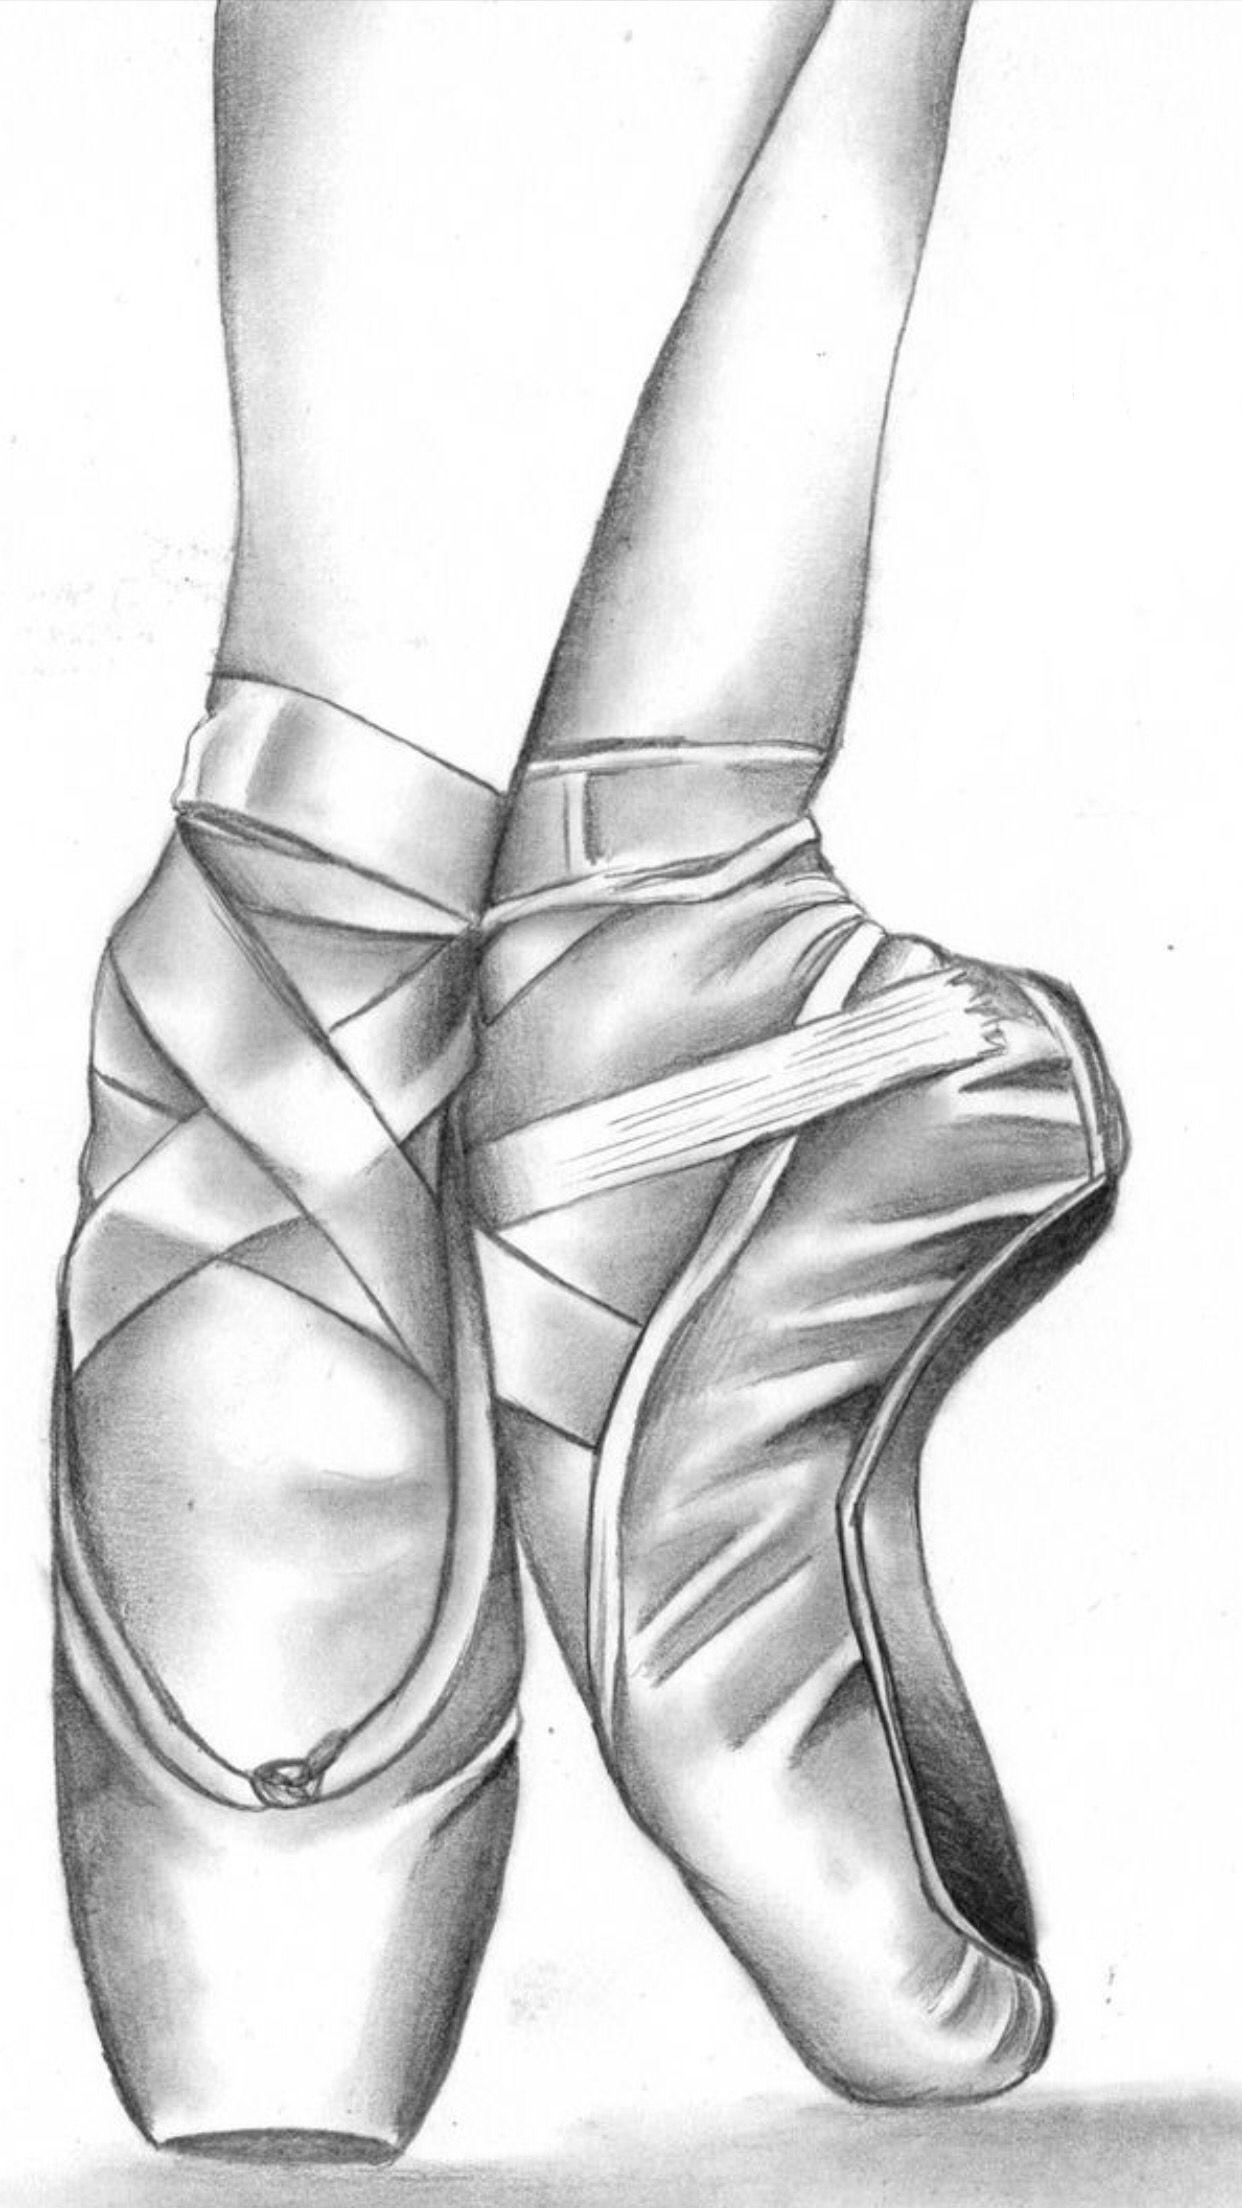 Pin de Angie Evelin Gomez en danza | Pinterest | Dibujo, Bailarines ...